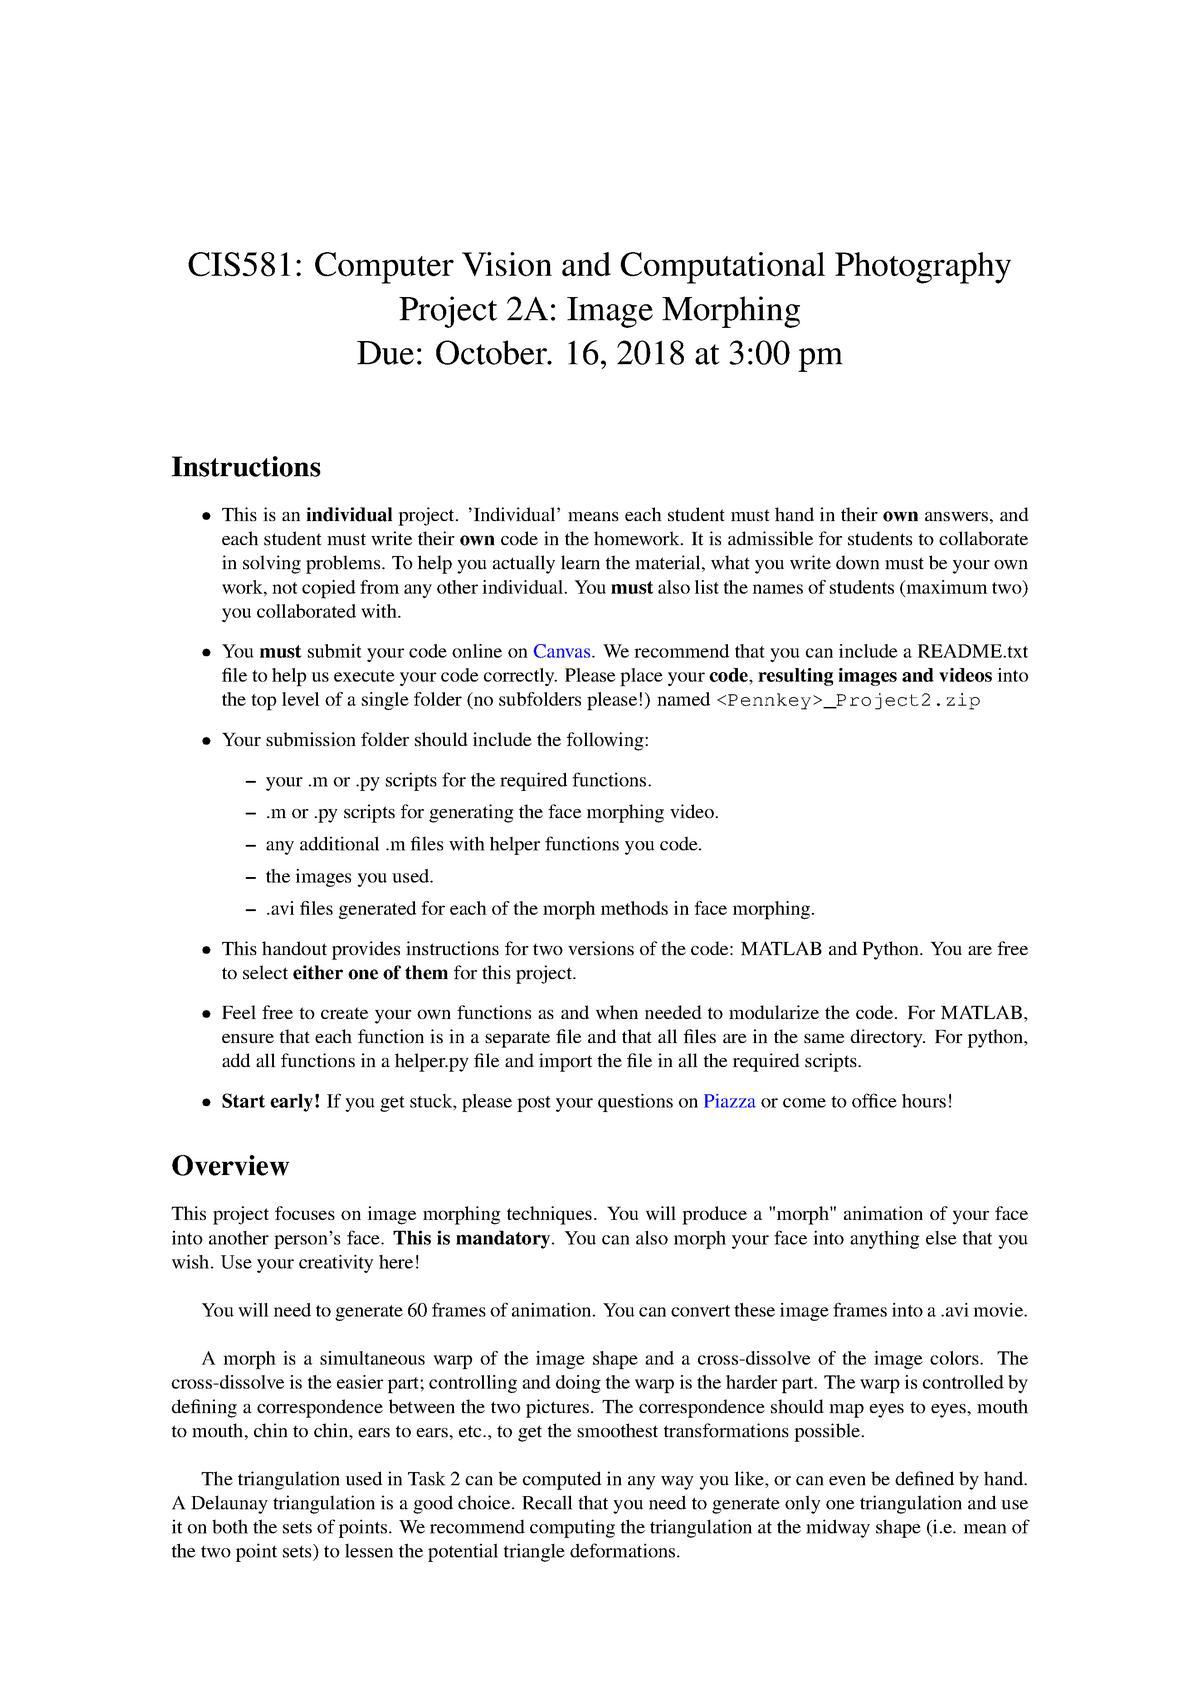 Cis581-computer-vision - CIS 581: Computer Vision & Computational